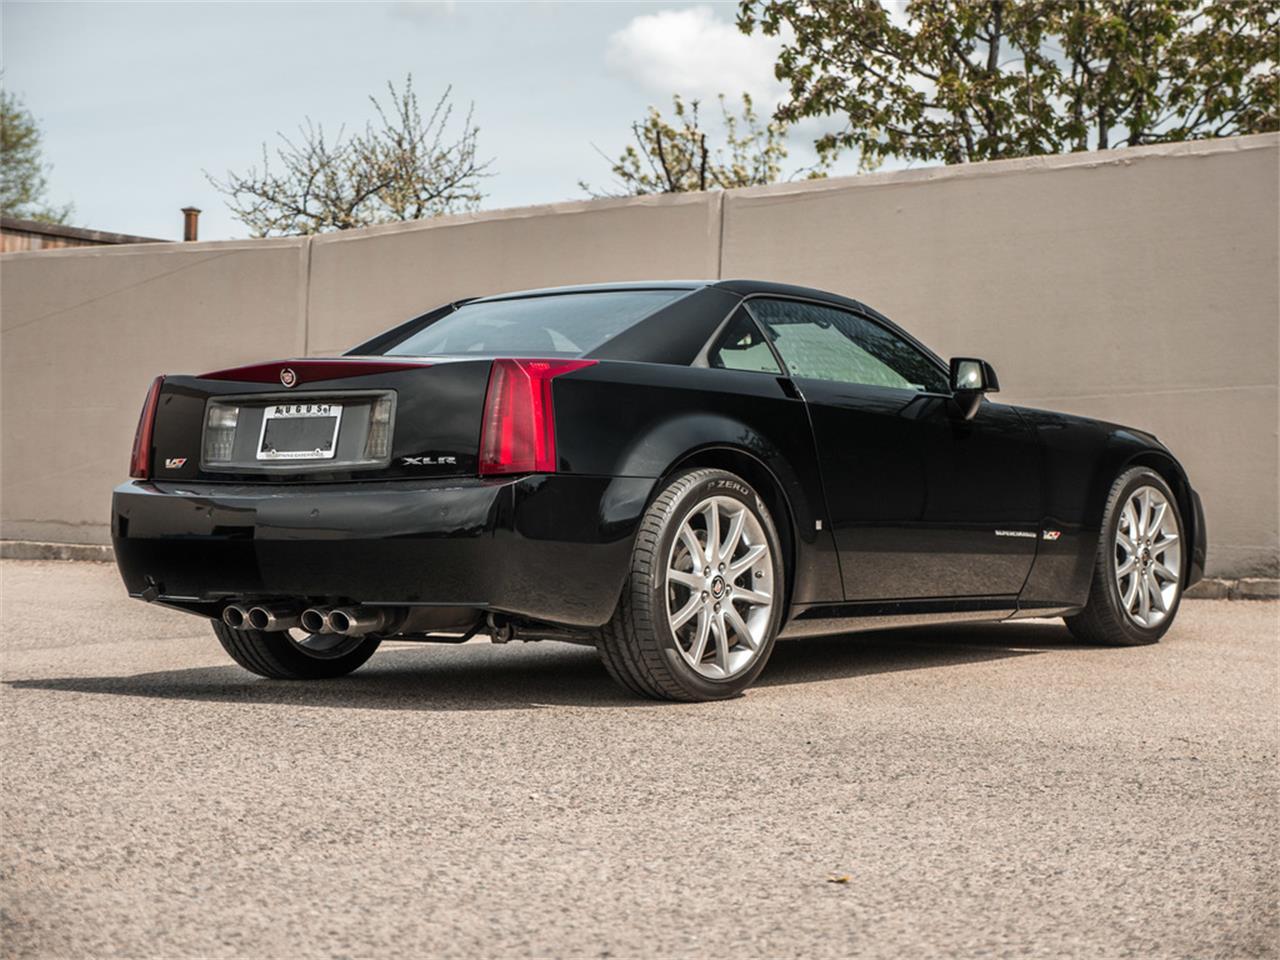 2007 Cadillac XLR-V for Sale | ClassicCars.com | CC-1235319